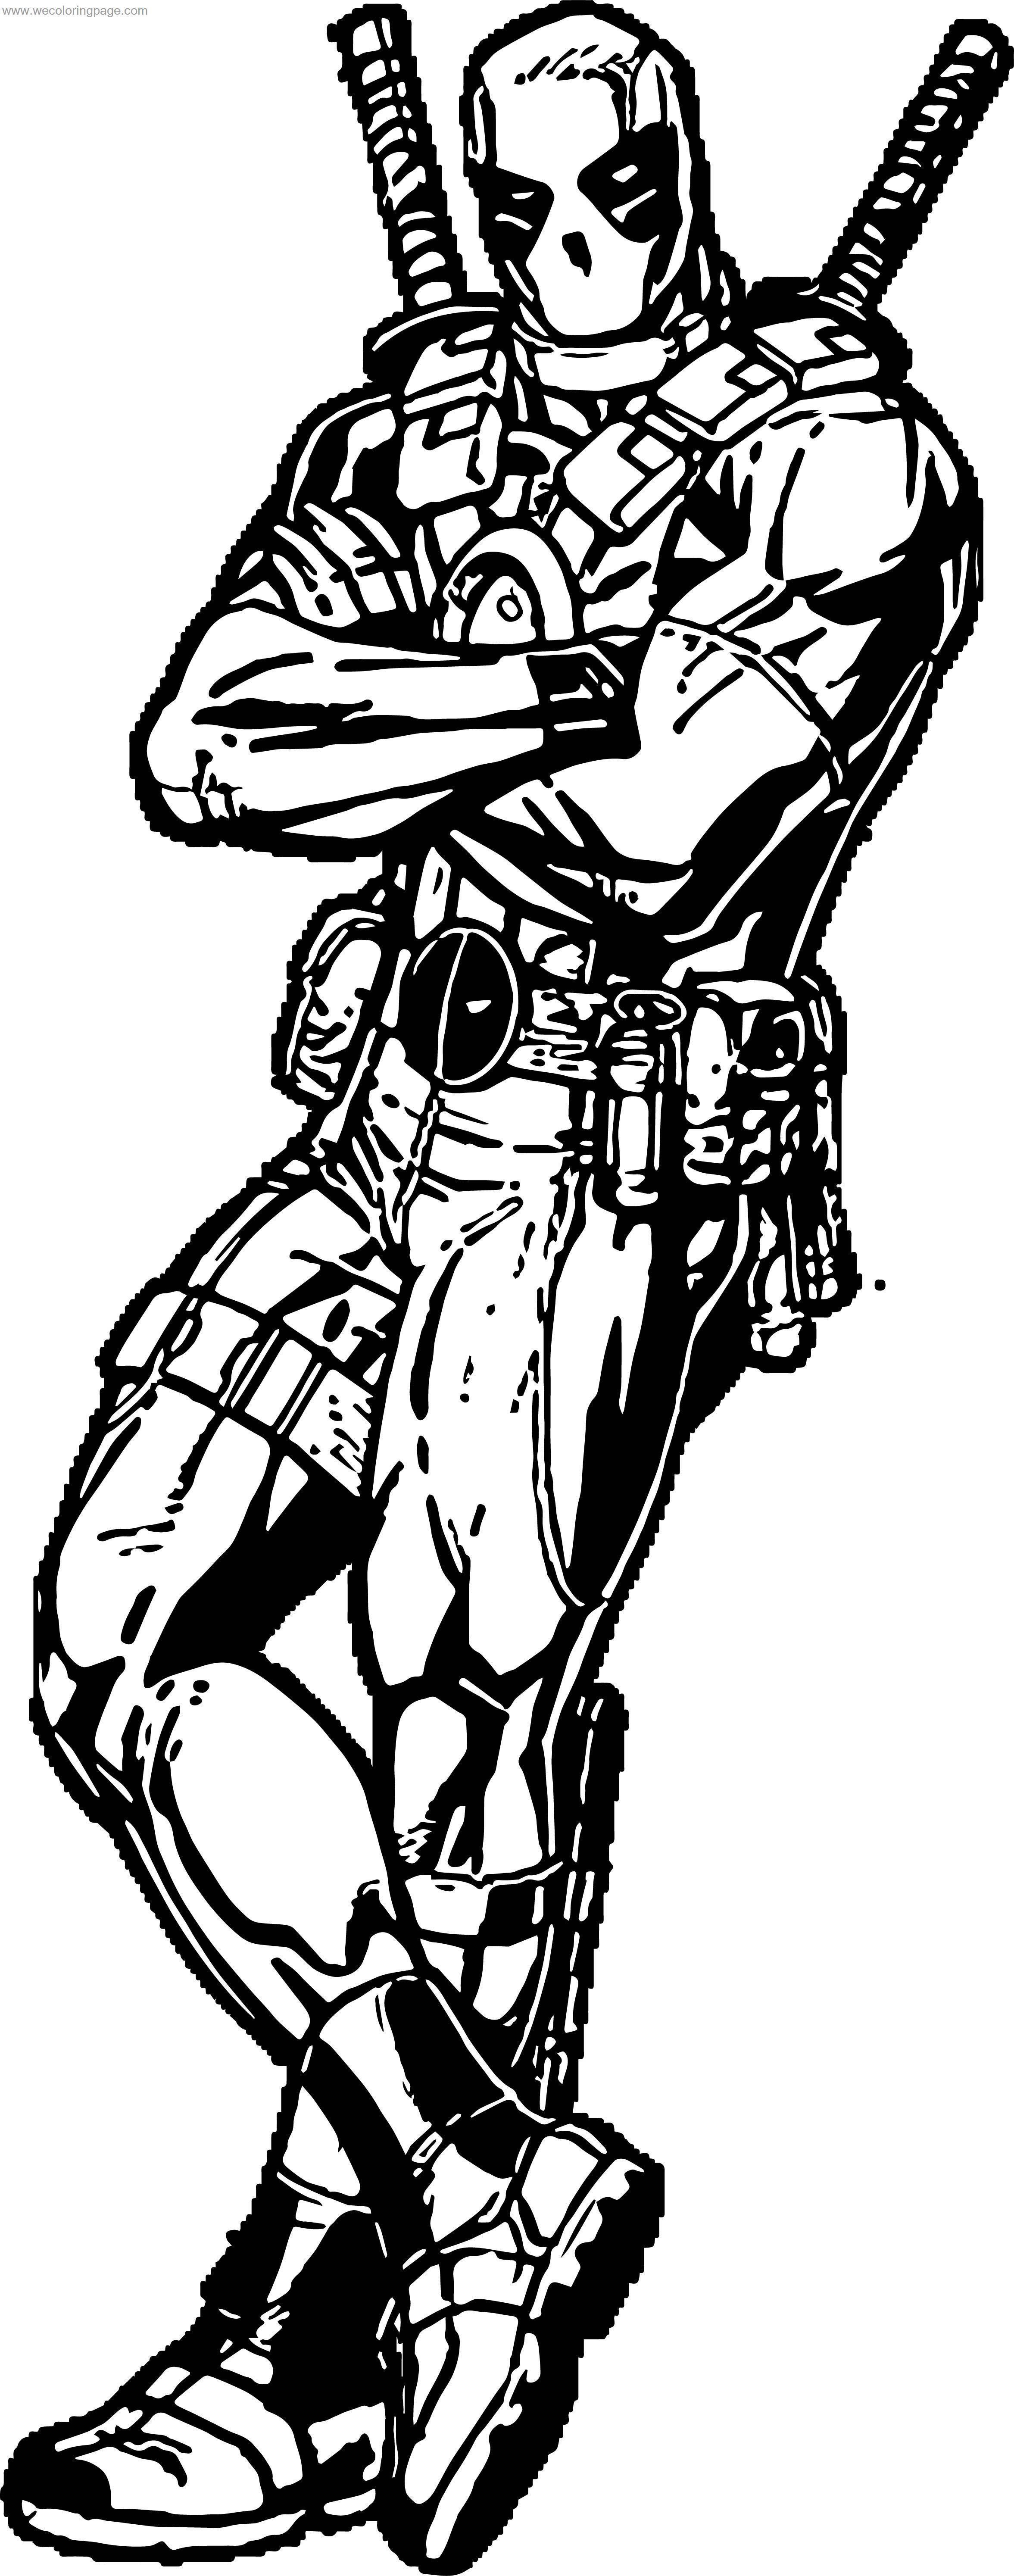 Move Deadpol Coloring Page